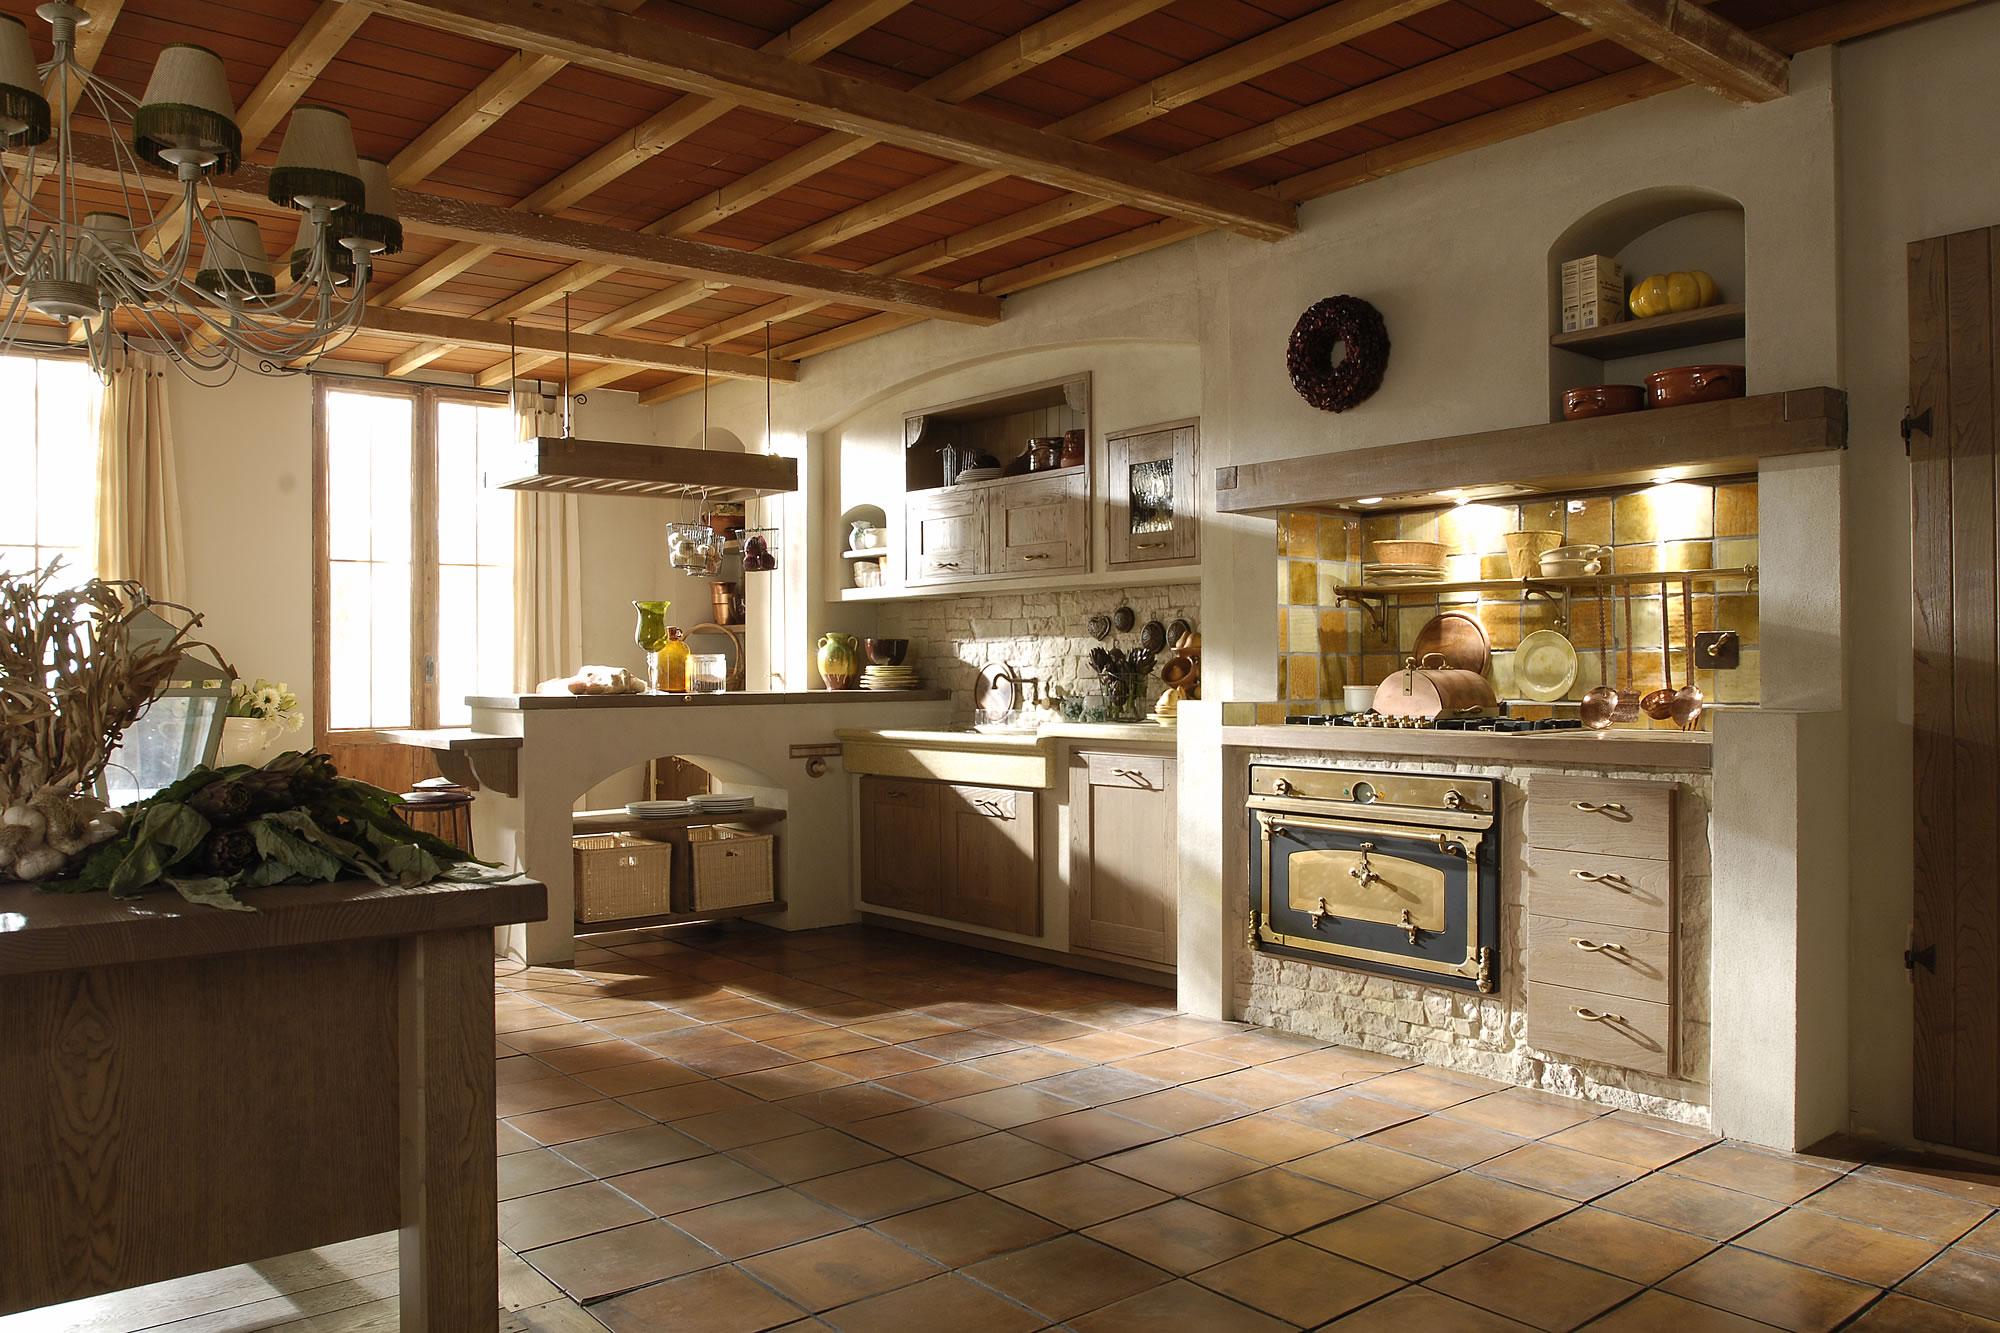 Cucine in muratura 15 idee per progettare una cucina for Arredare una taverna rustica